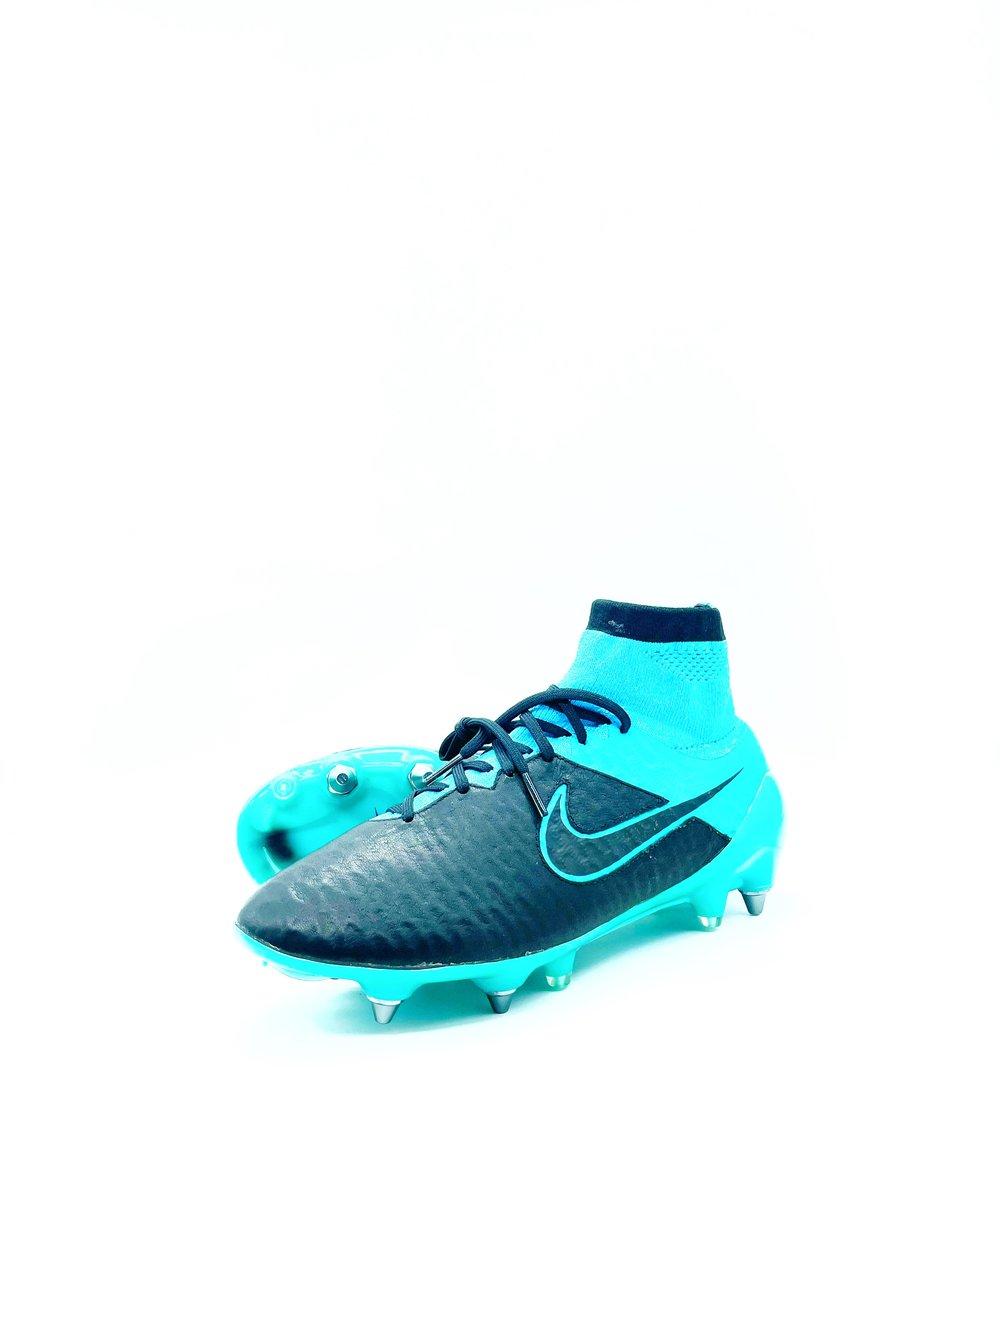 Image of Nike Magista Obra I SG LEATHER